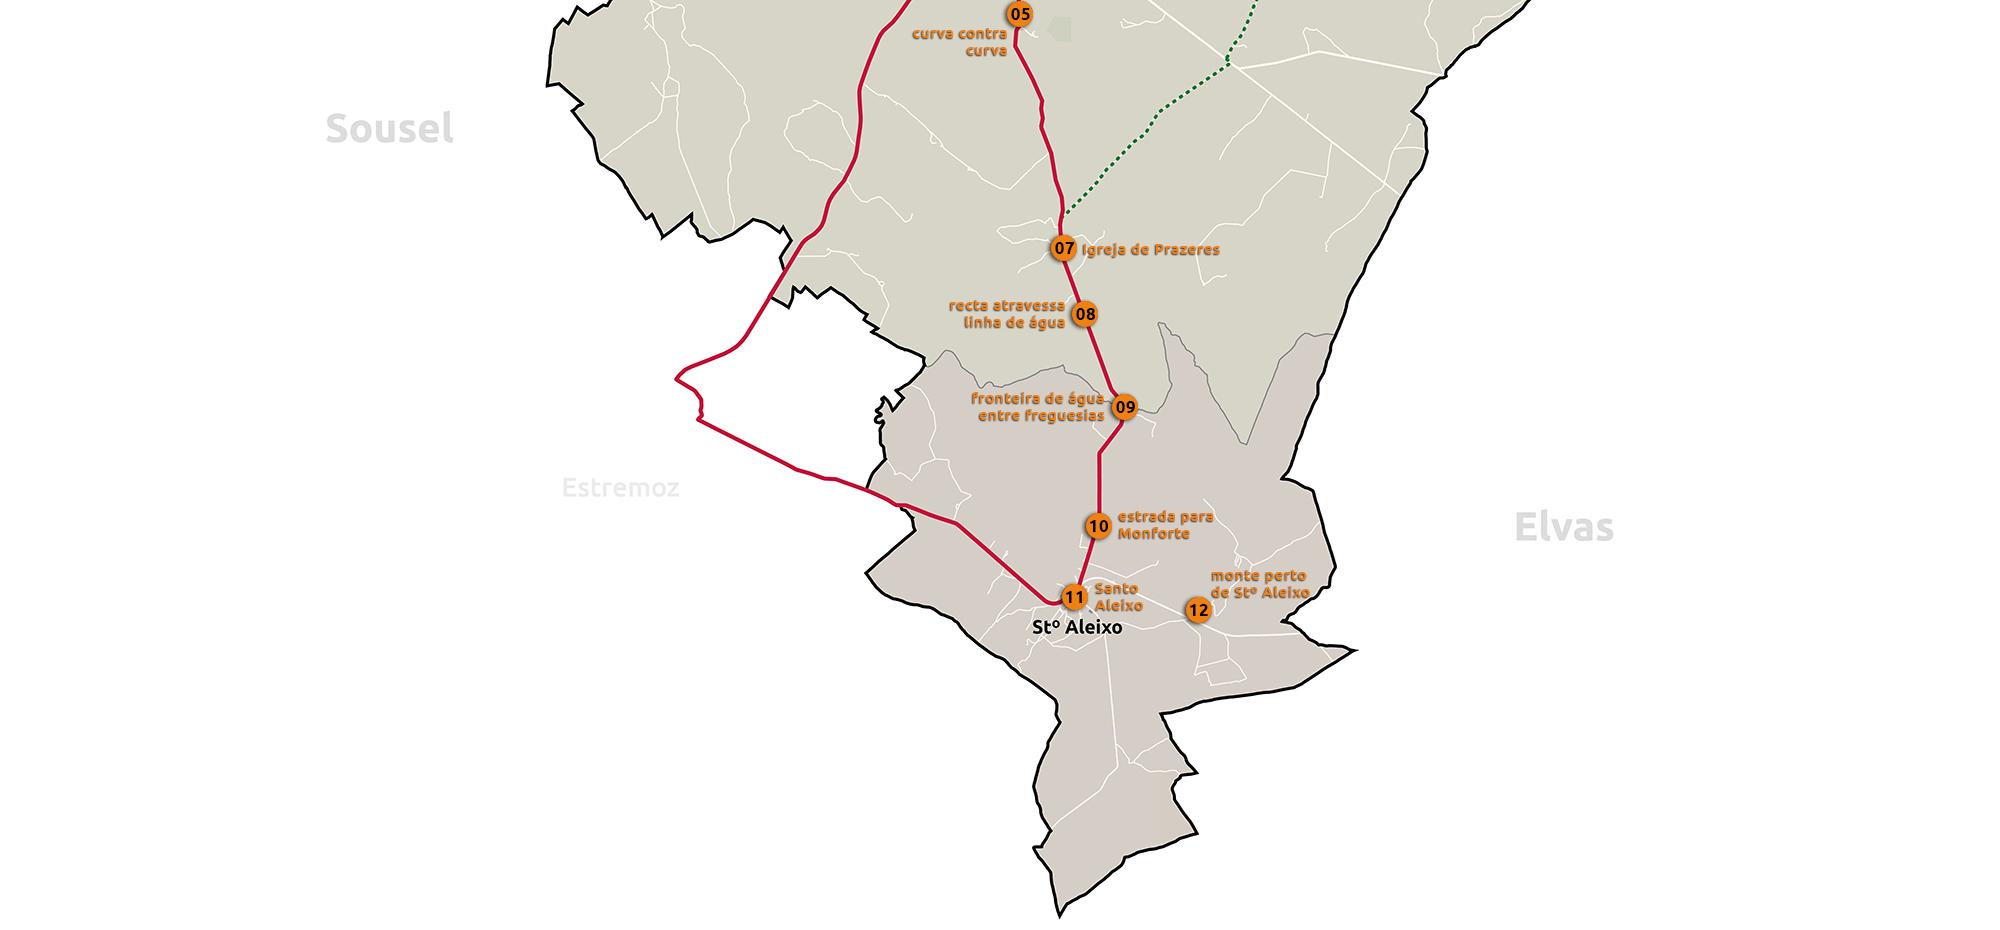 mapa_aumentado_2000x930_monforte_141015-02